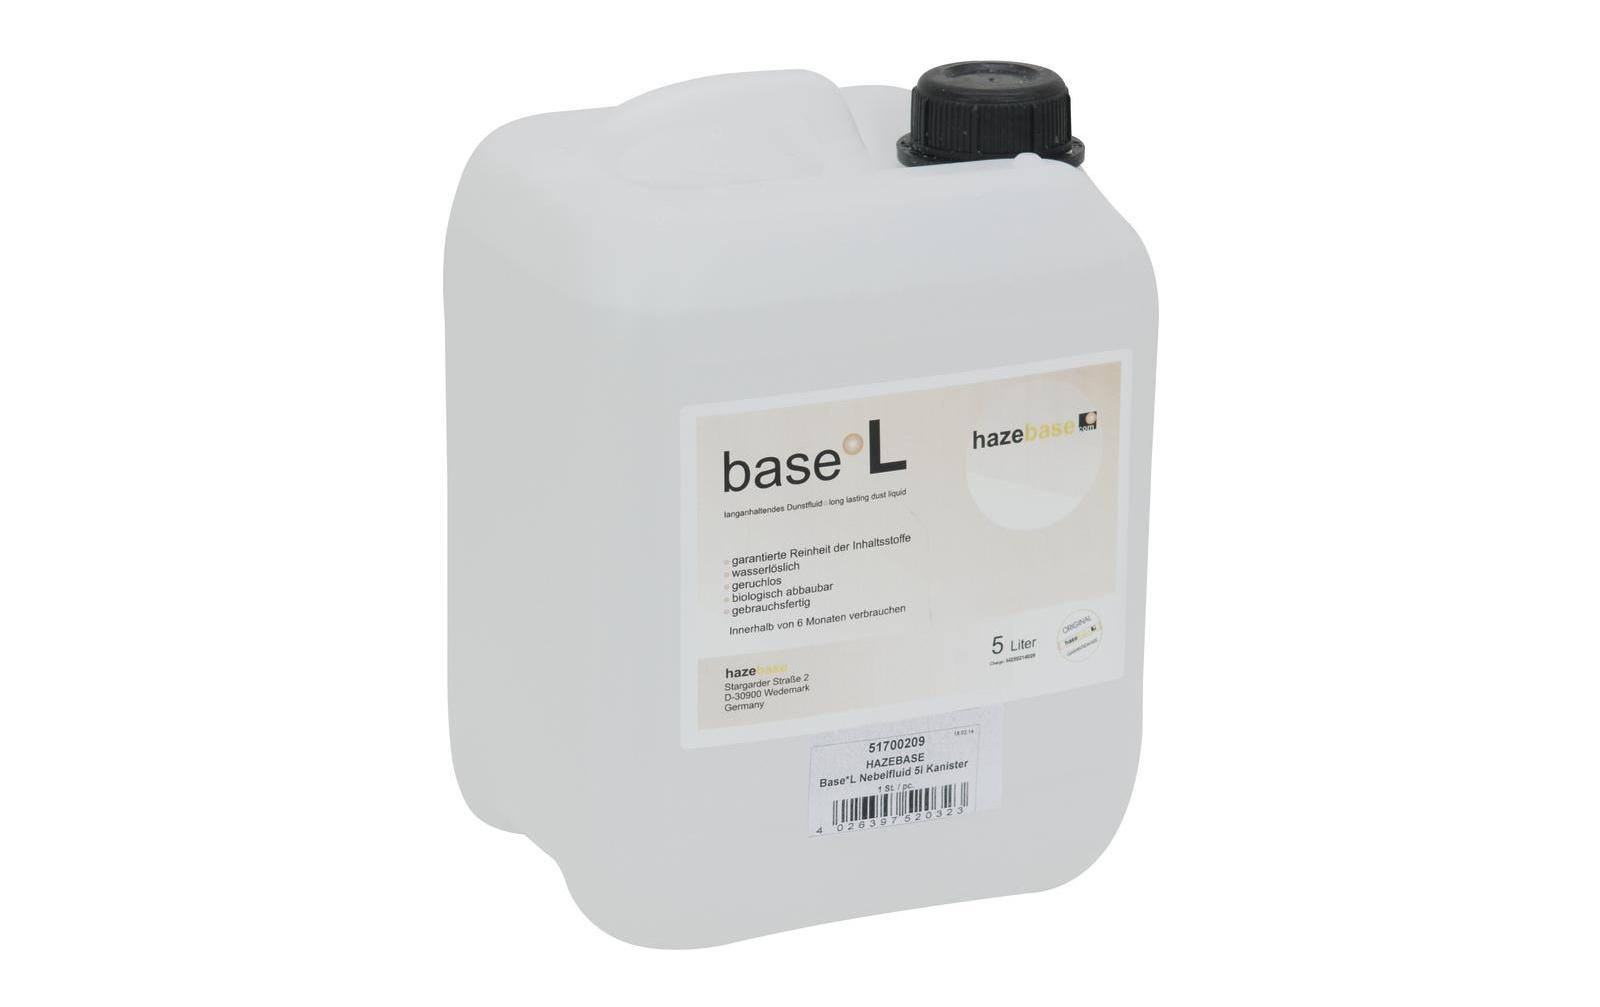 hazebase-base-l-nebelfluid-25l-kanister